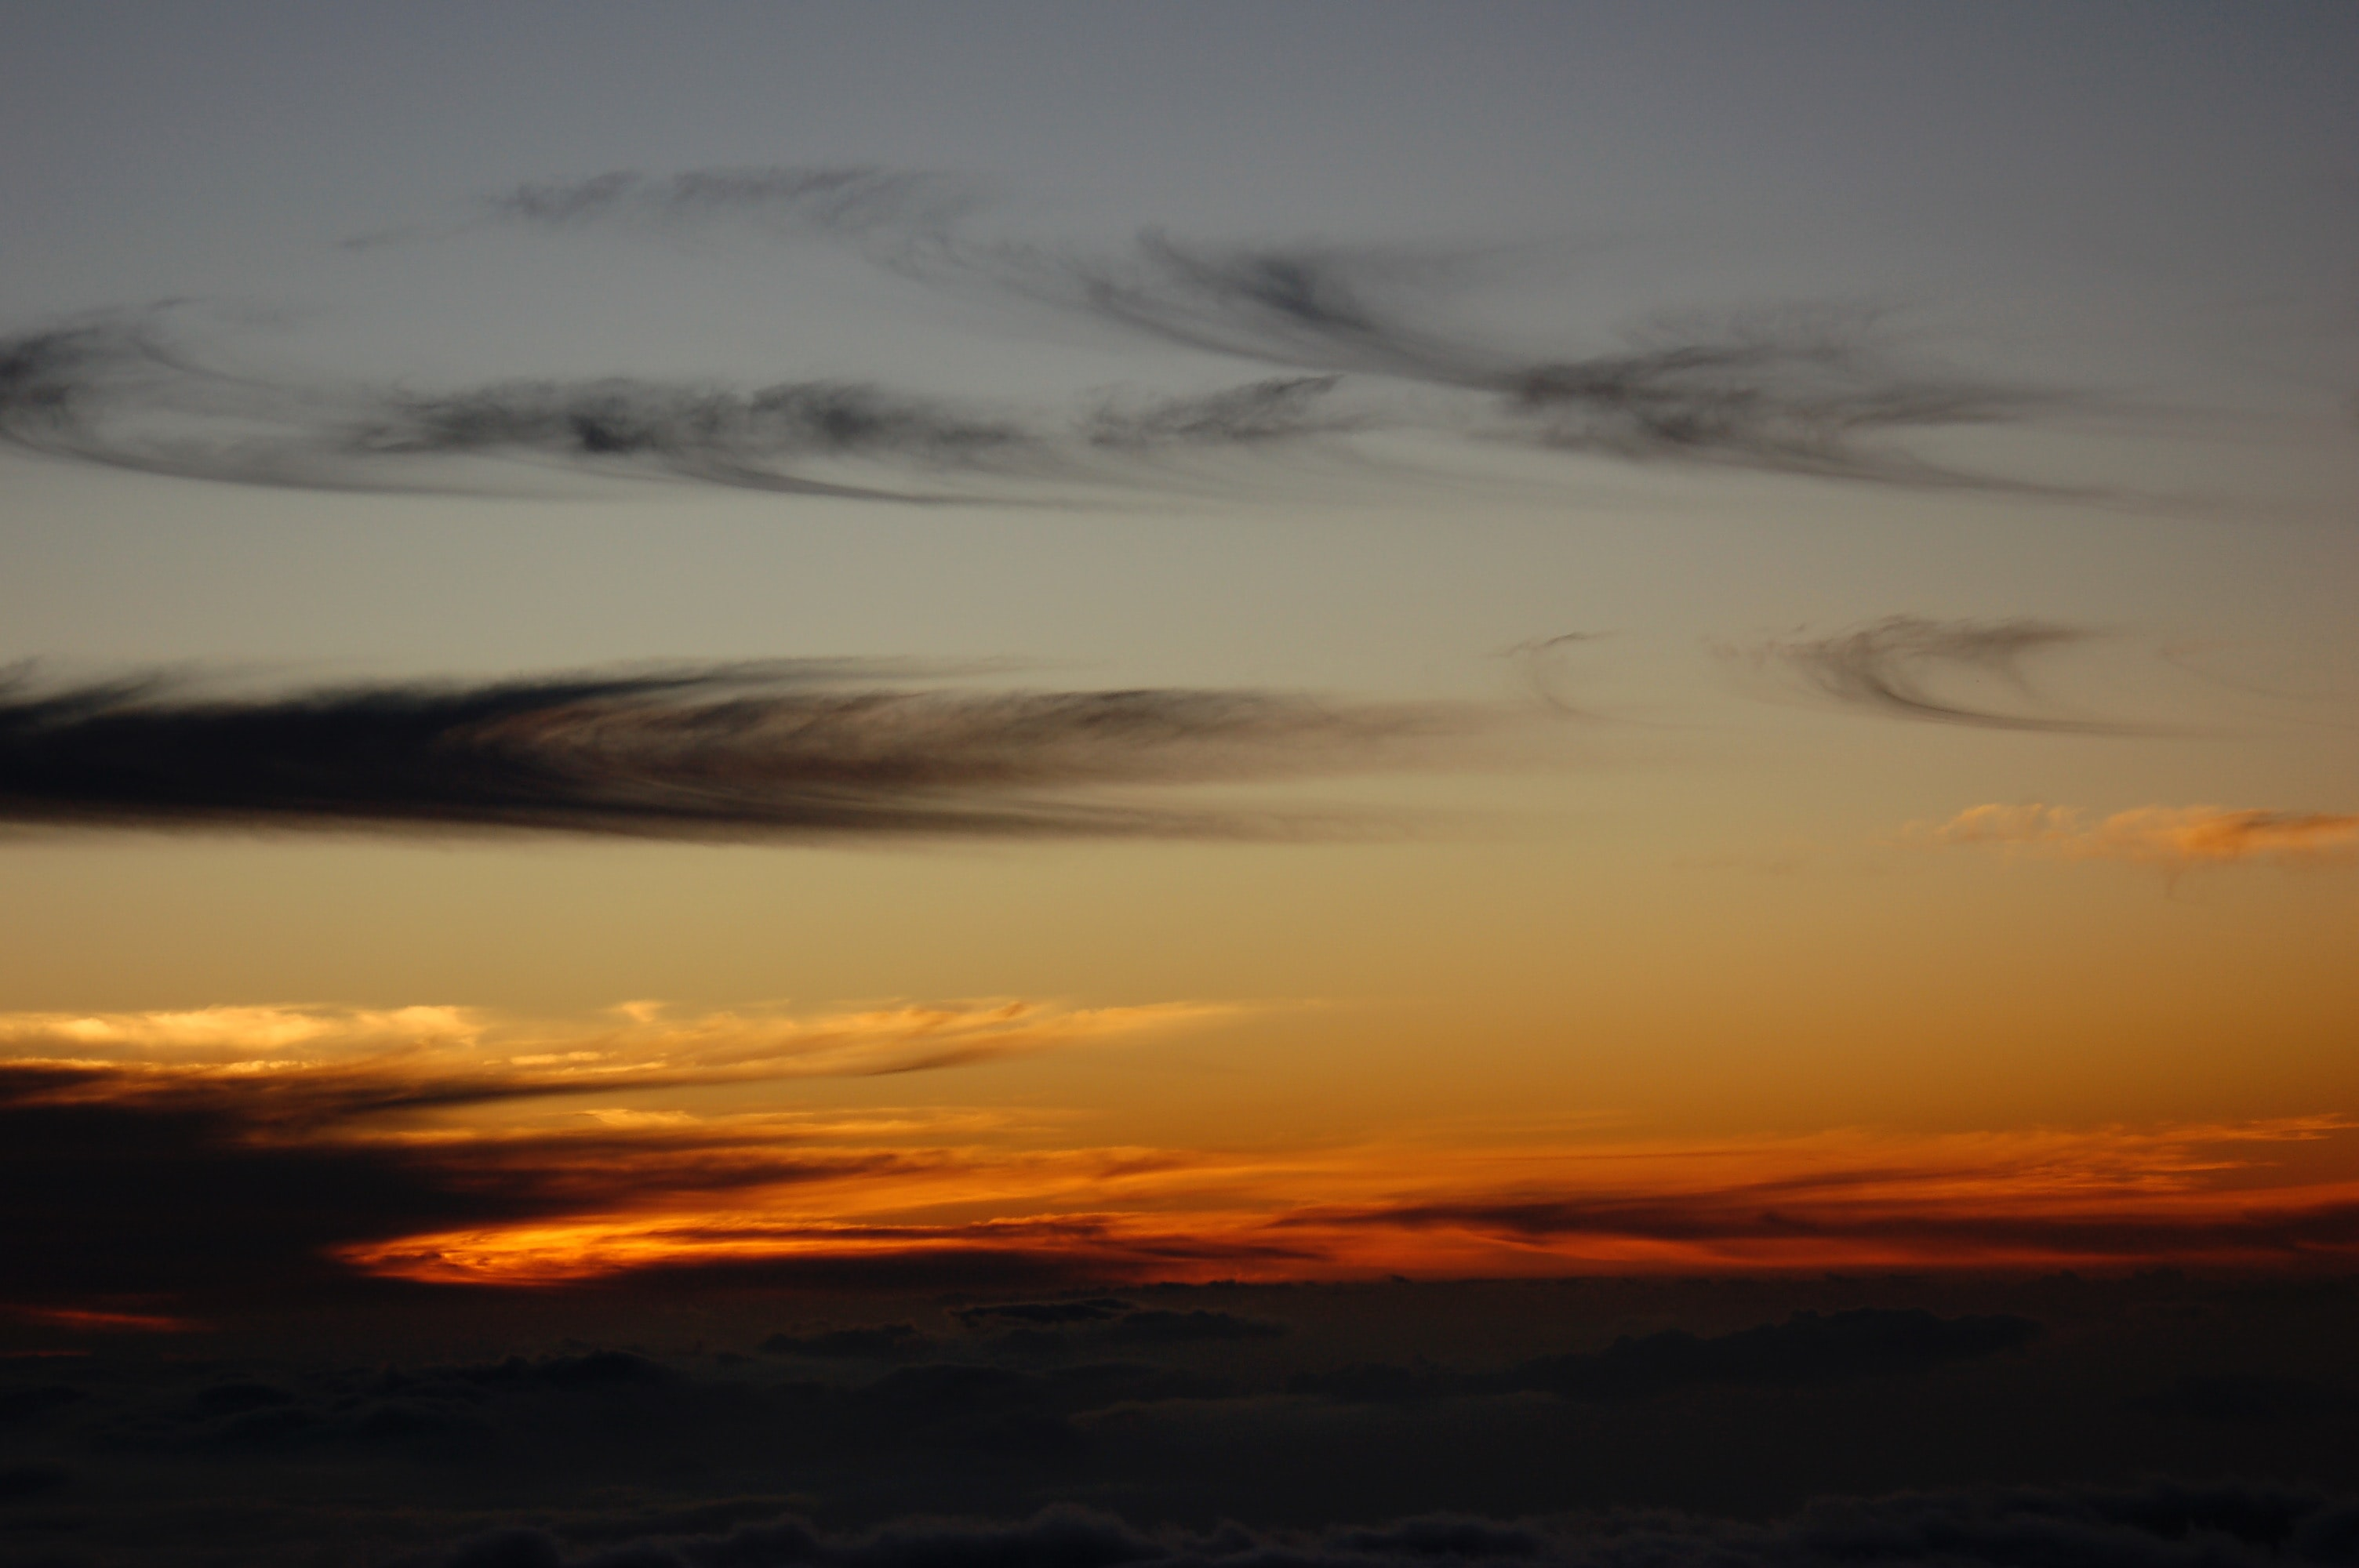 aerial photo of golden hour sky